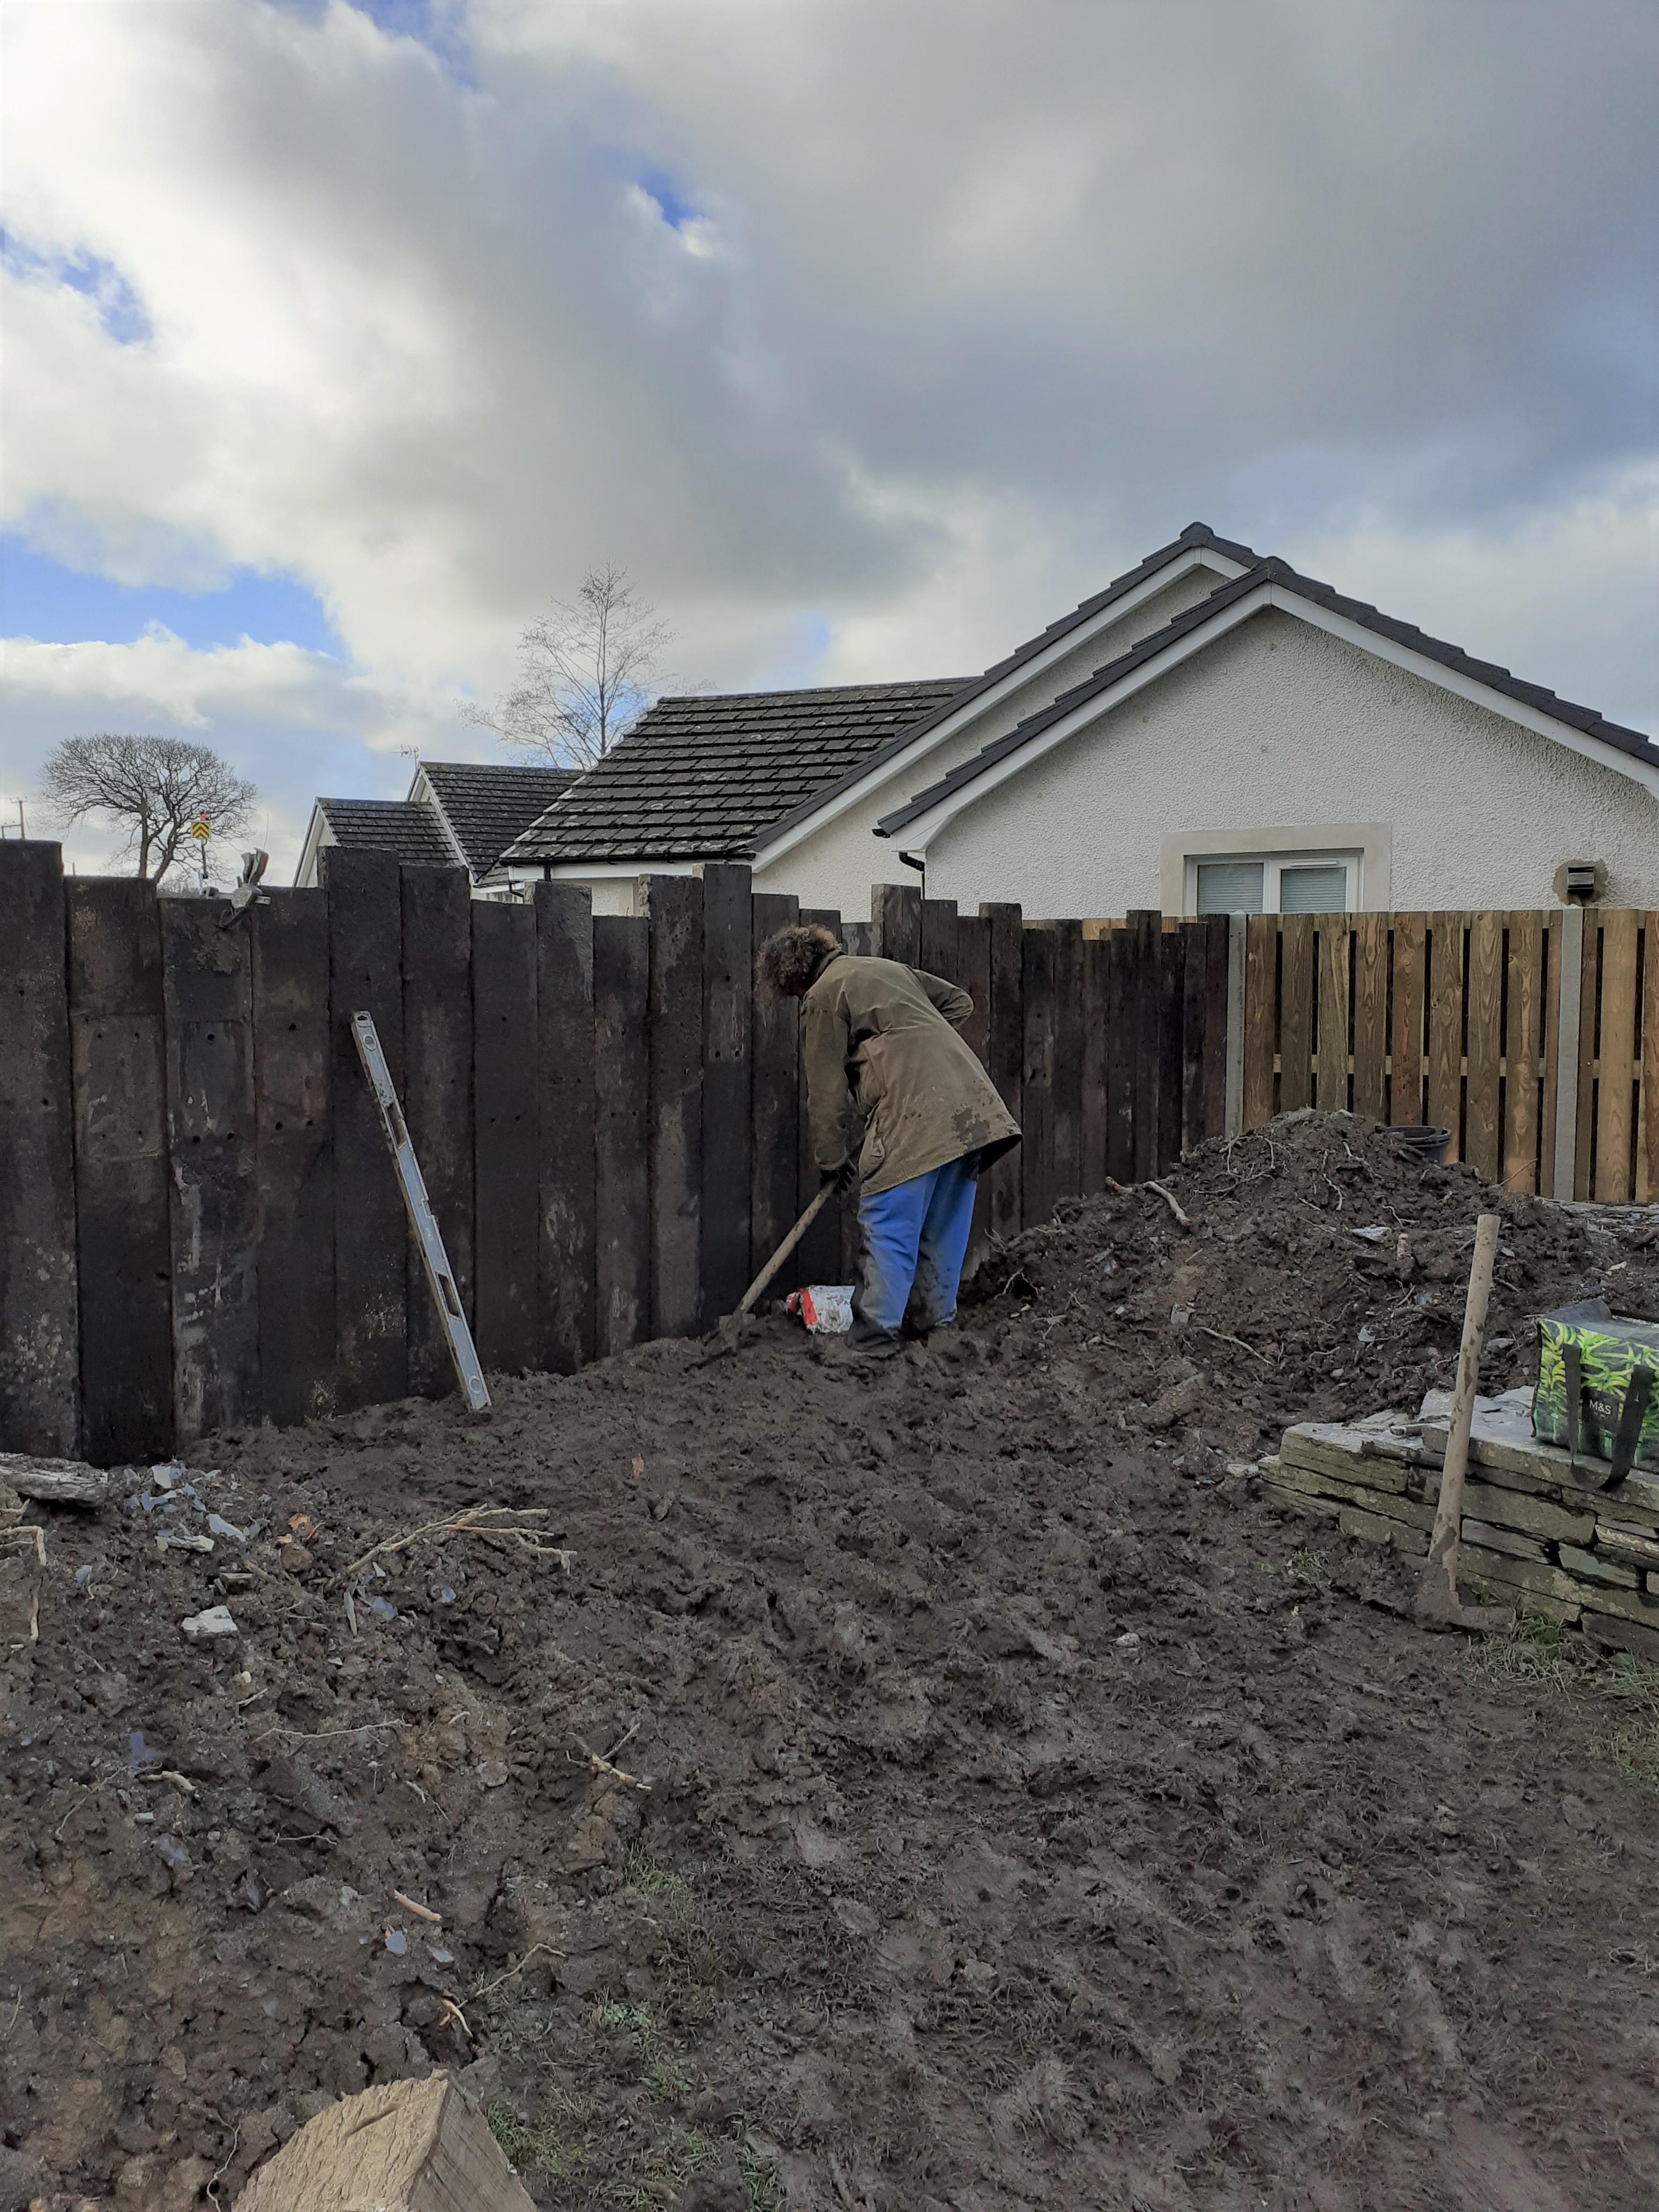 landworks-working-in-the mud-llechryd